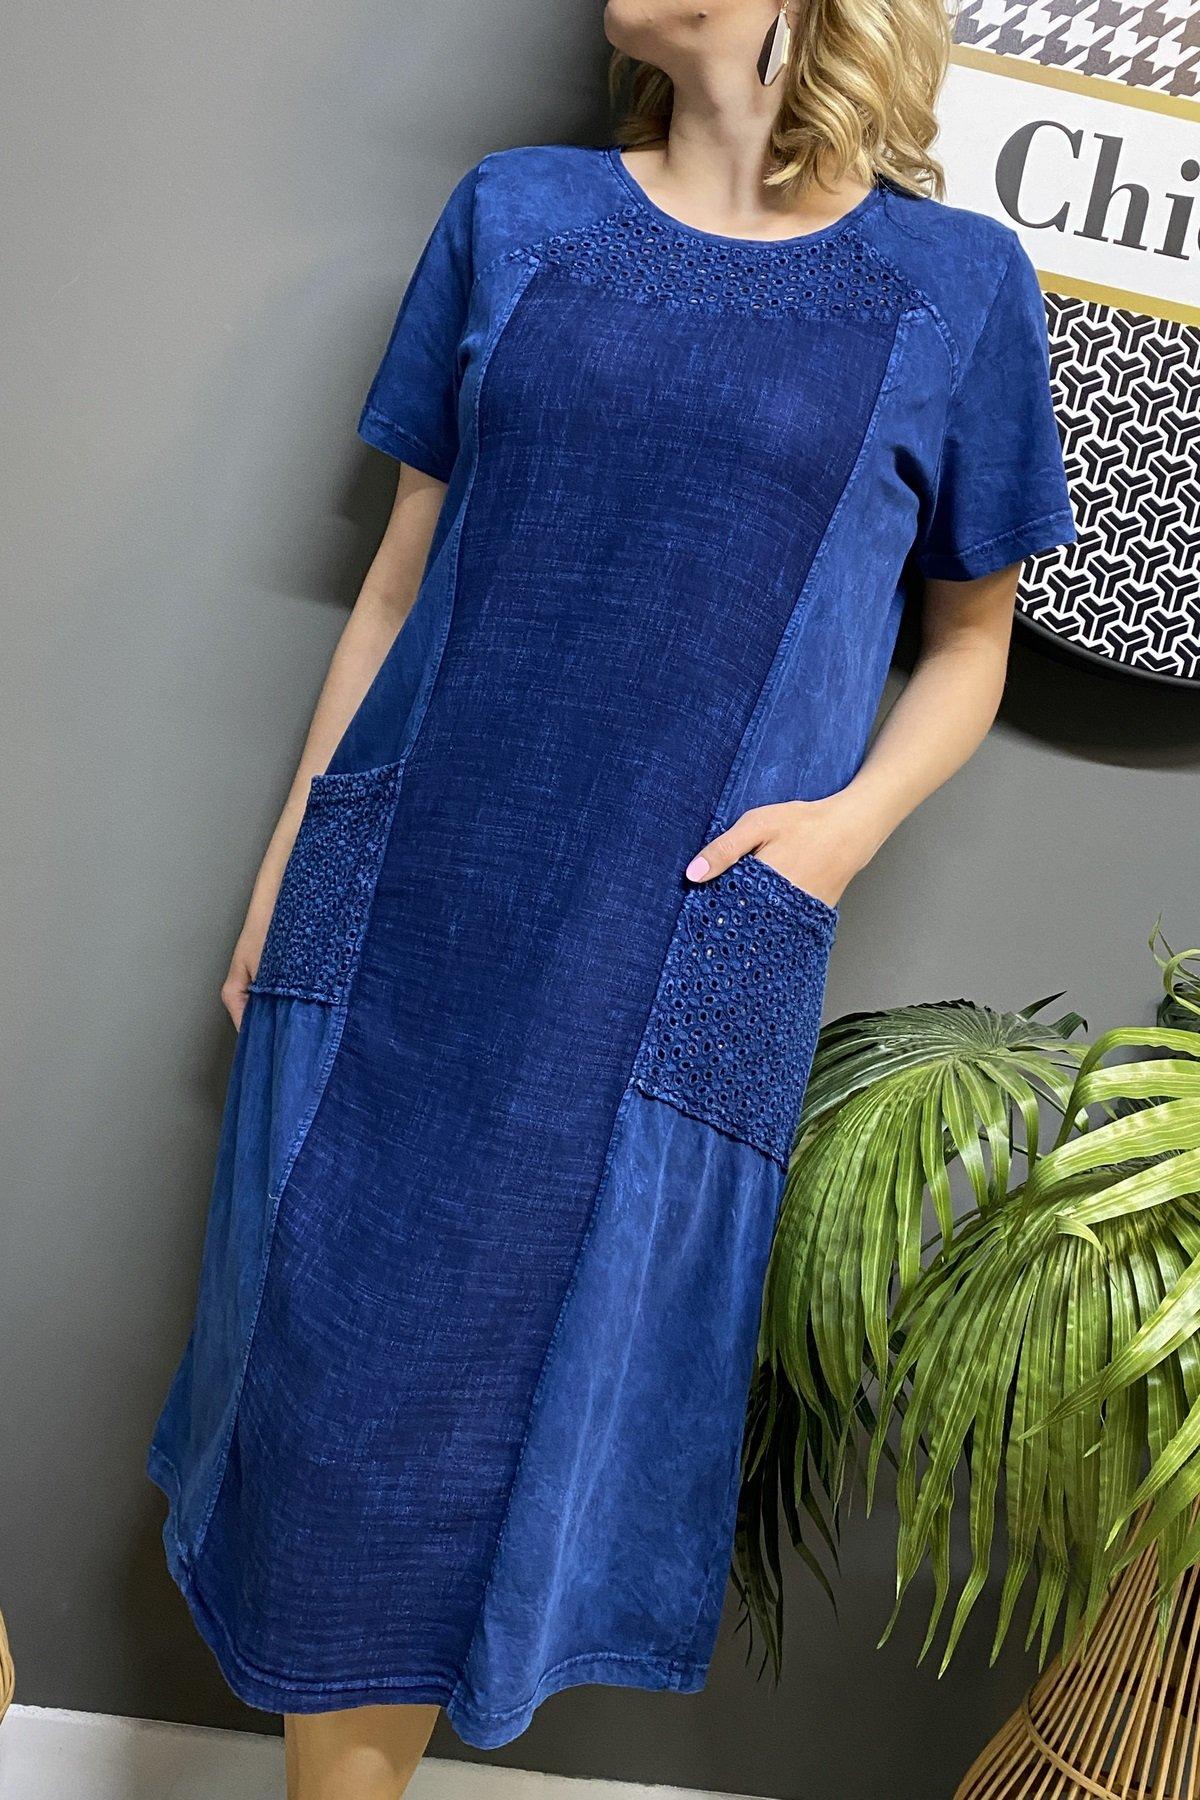 https://resim.chicbag.com.tr/p000674/lcv/gogus-ustu-ve-cepleri-gupur-yuvarlak-yaka-kisa-kollu-elbise-swns-01b03df7188a.